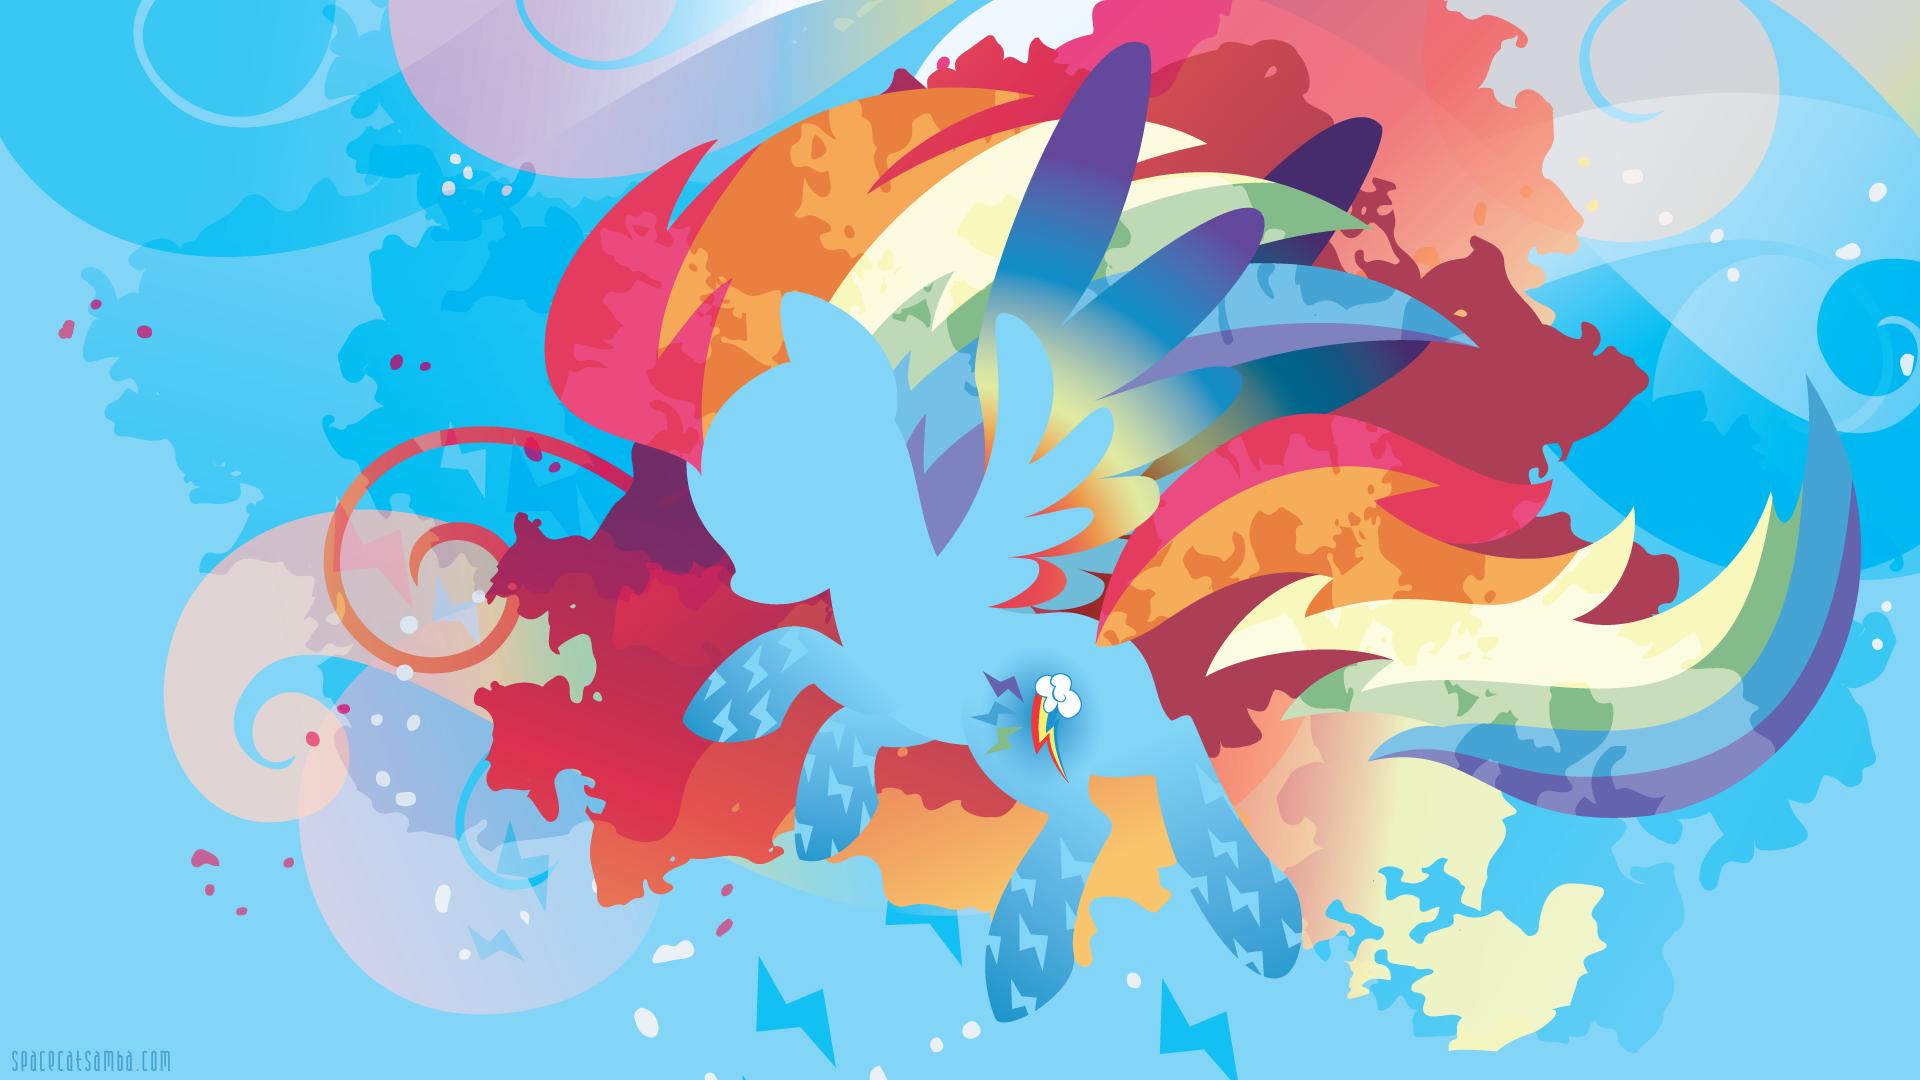 Mlp Rainbow Dash Wallpaper 572955 My Little Pony Wallpaper My